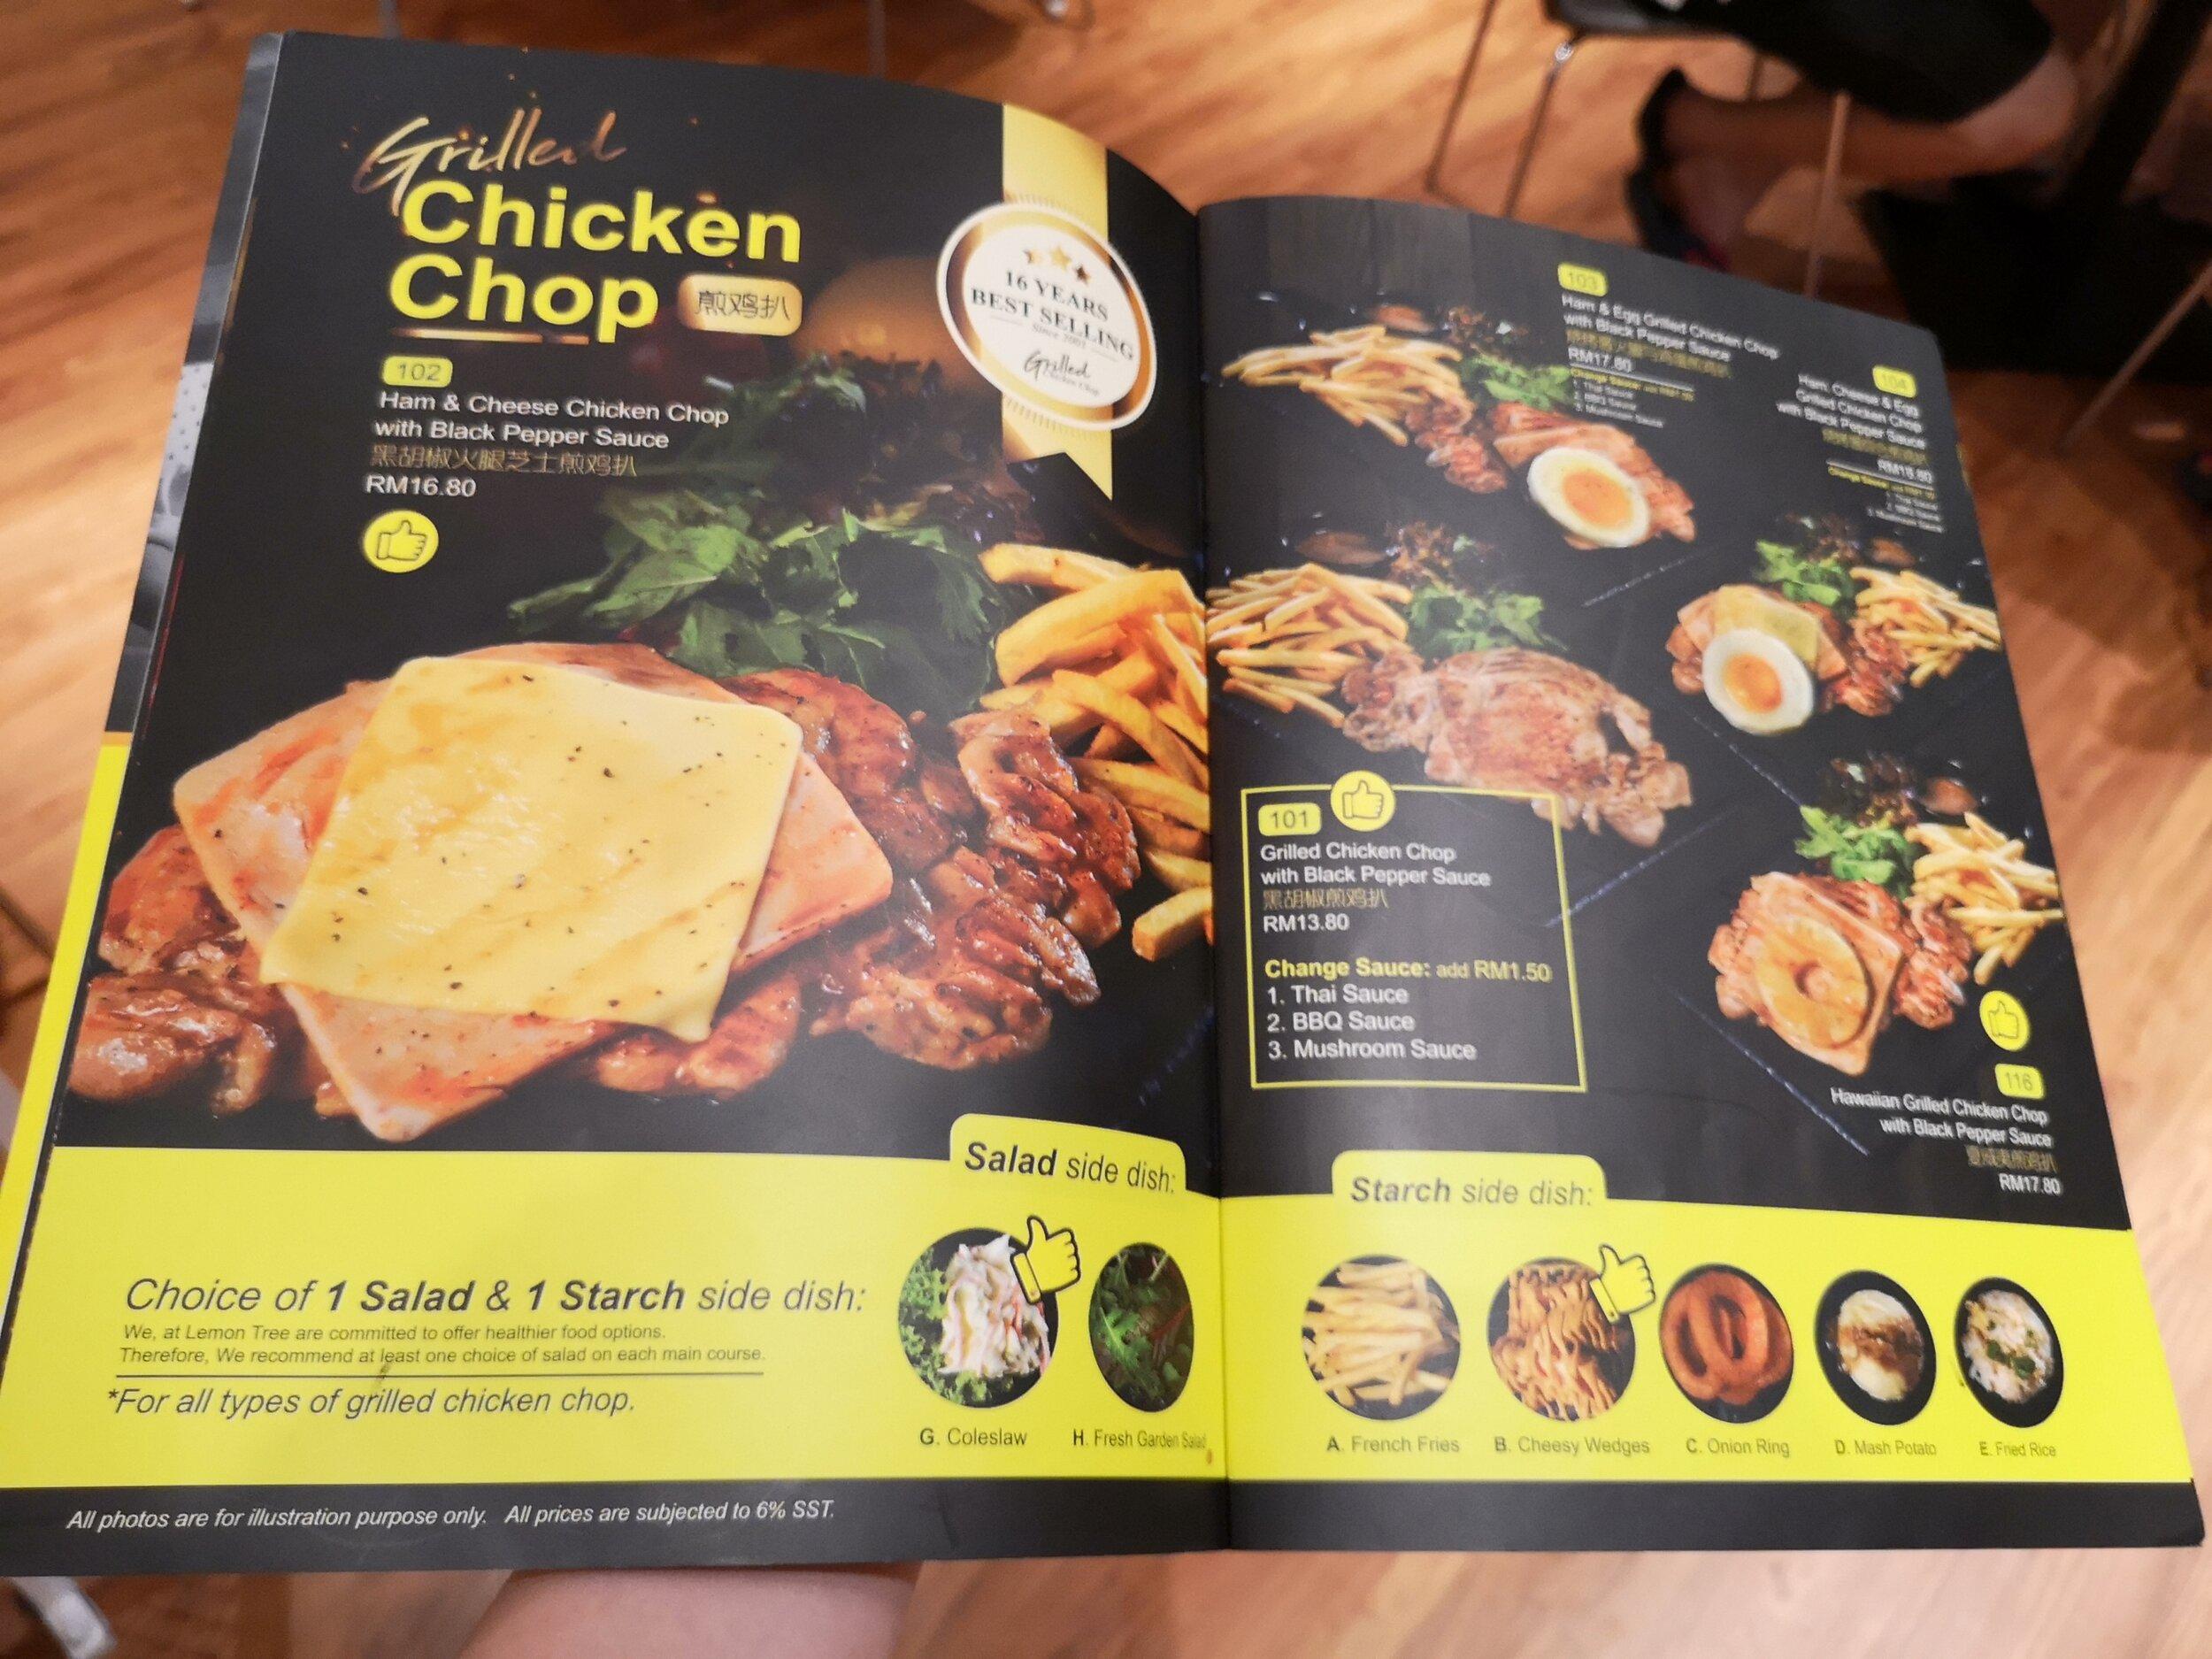 Lemon Tree Chicken Chop Menu